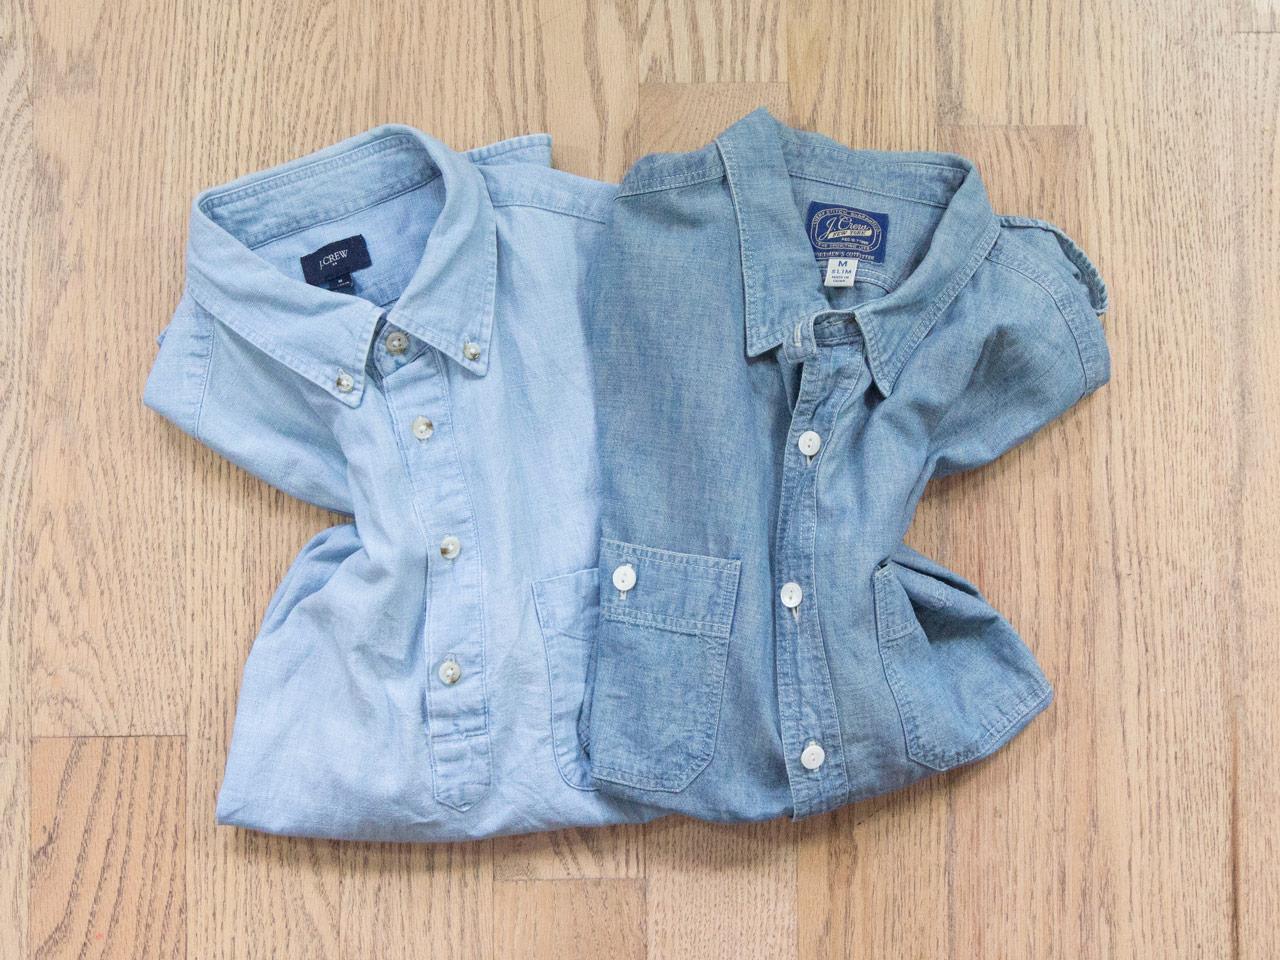 effortless essentials minimalist wardrobe - chambray shirts